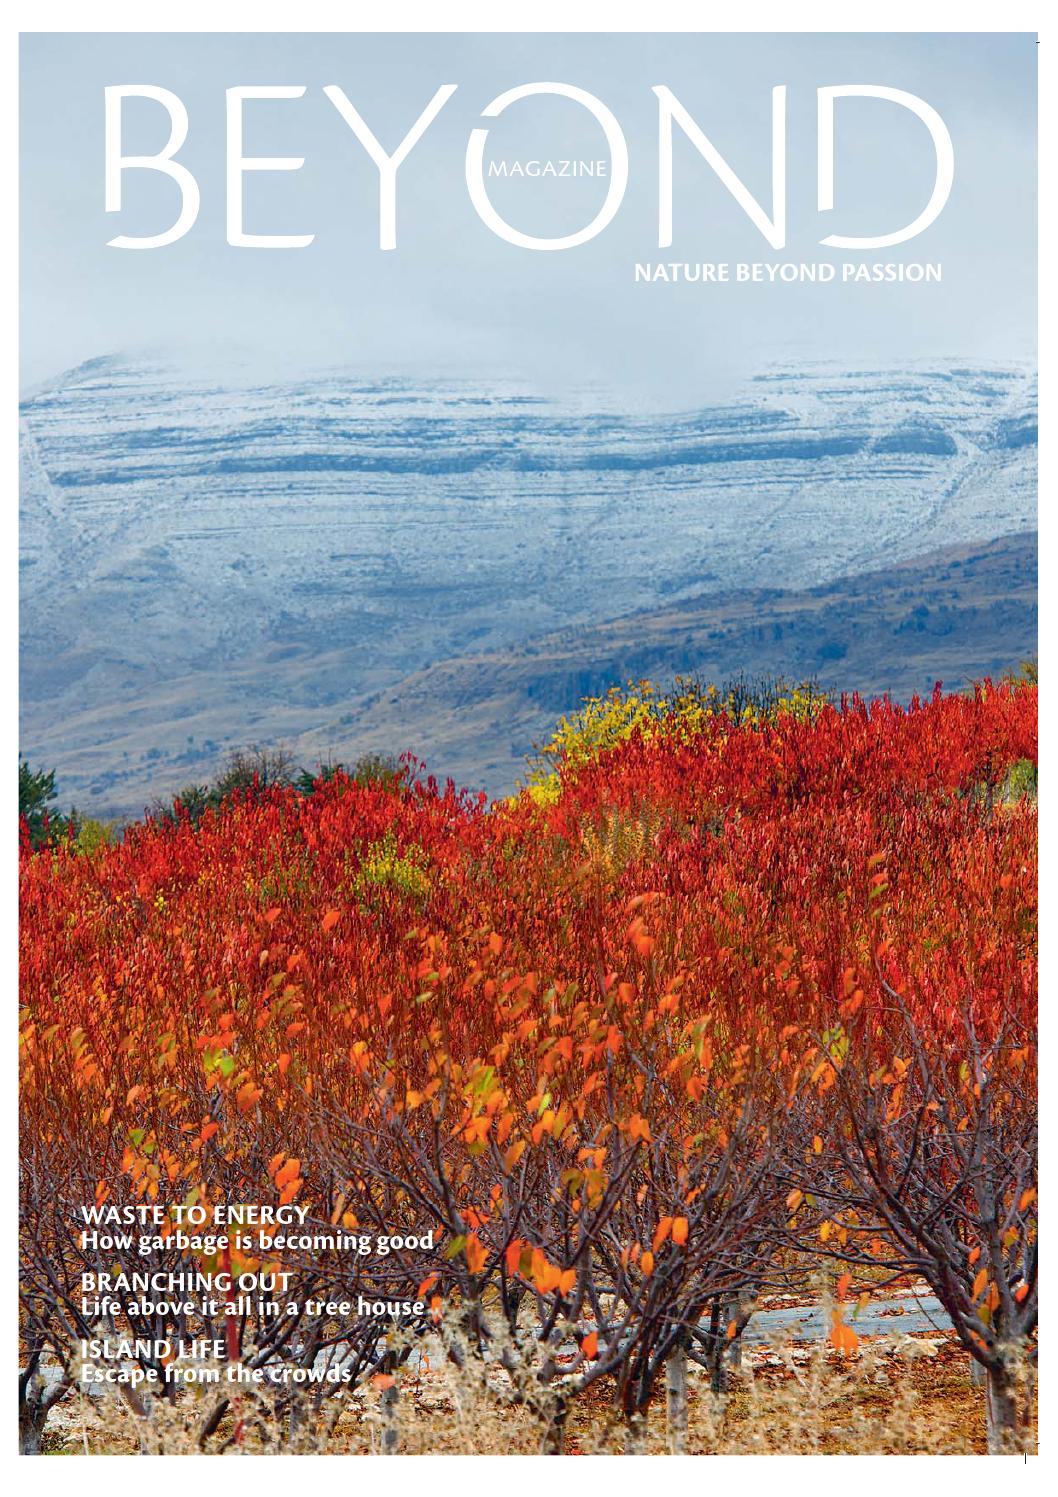 Beyond Magazine Issue 7 Winter 2012 by Beyond Magazine issuu